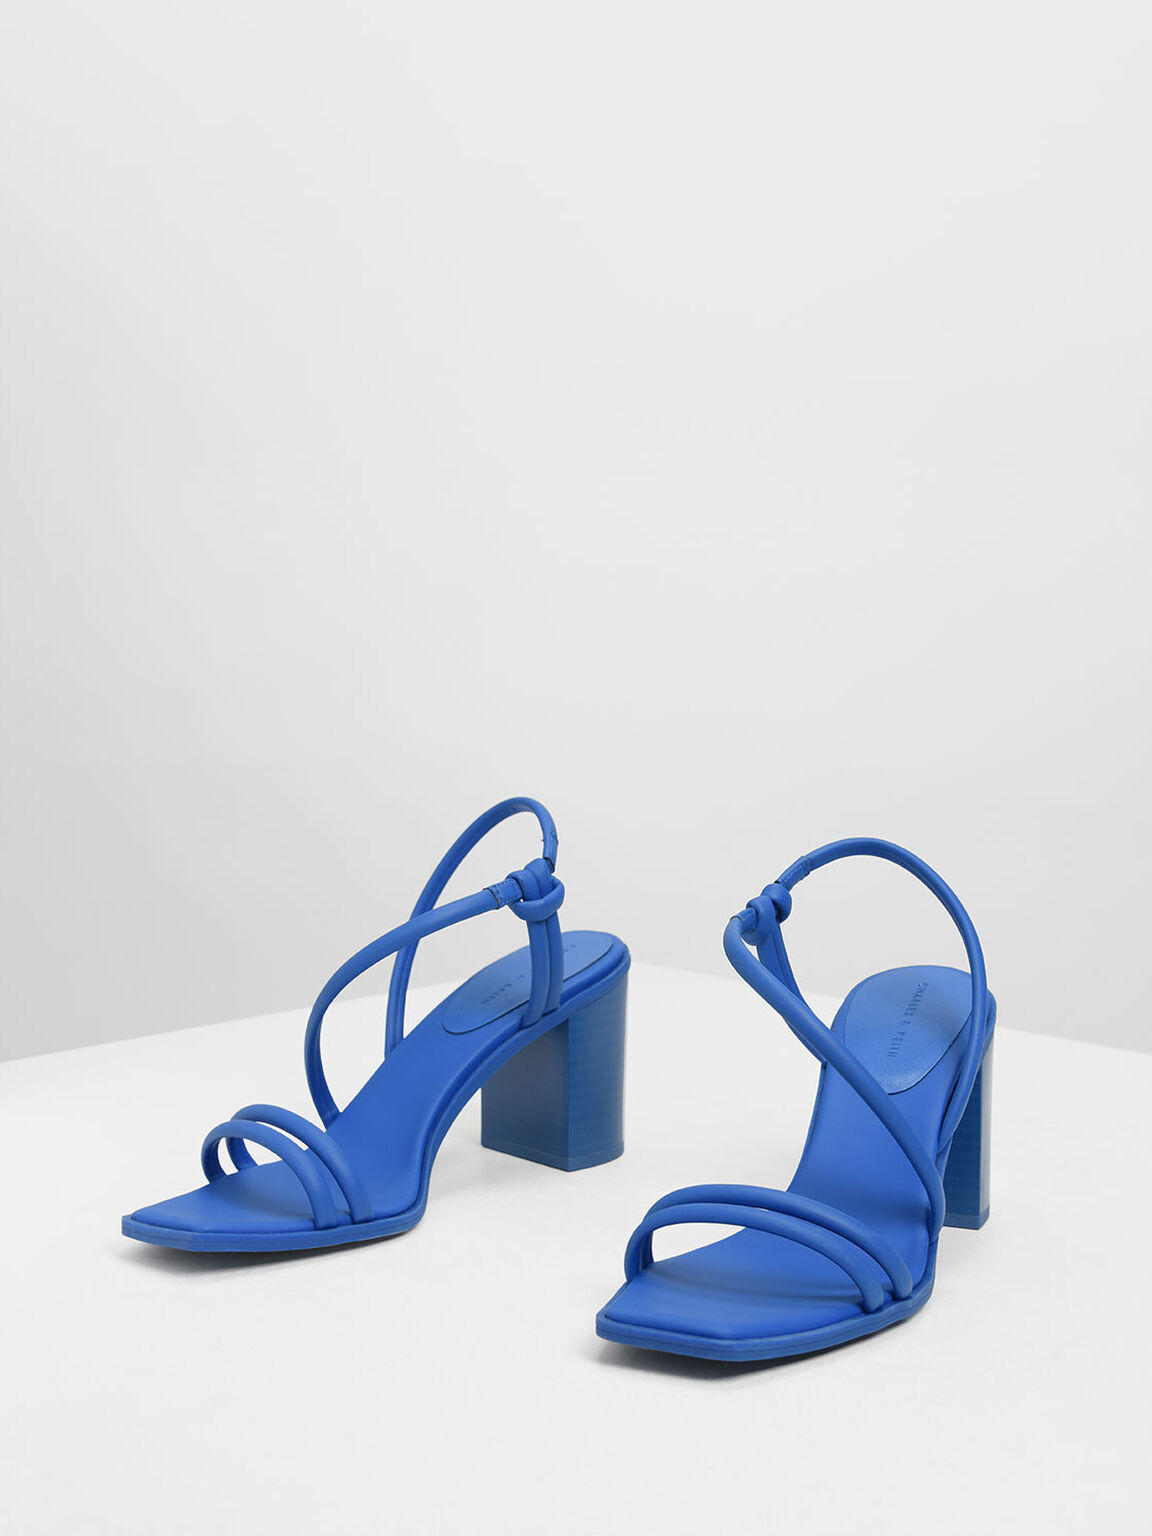 Asymmetrical Strappy Block Heels, Blue, hi-res